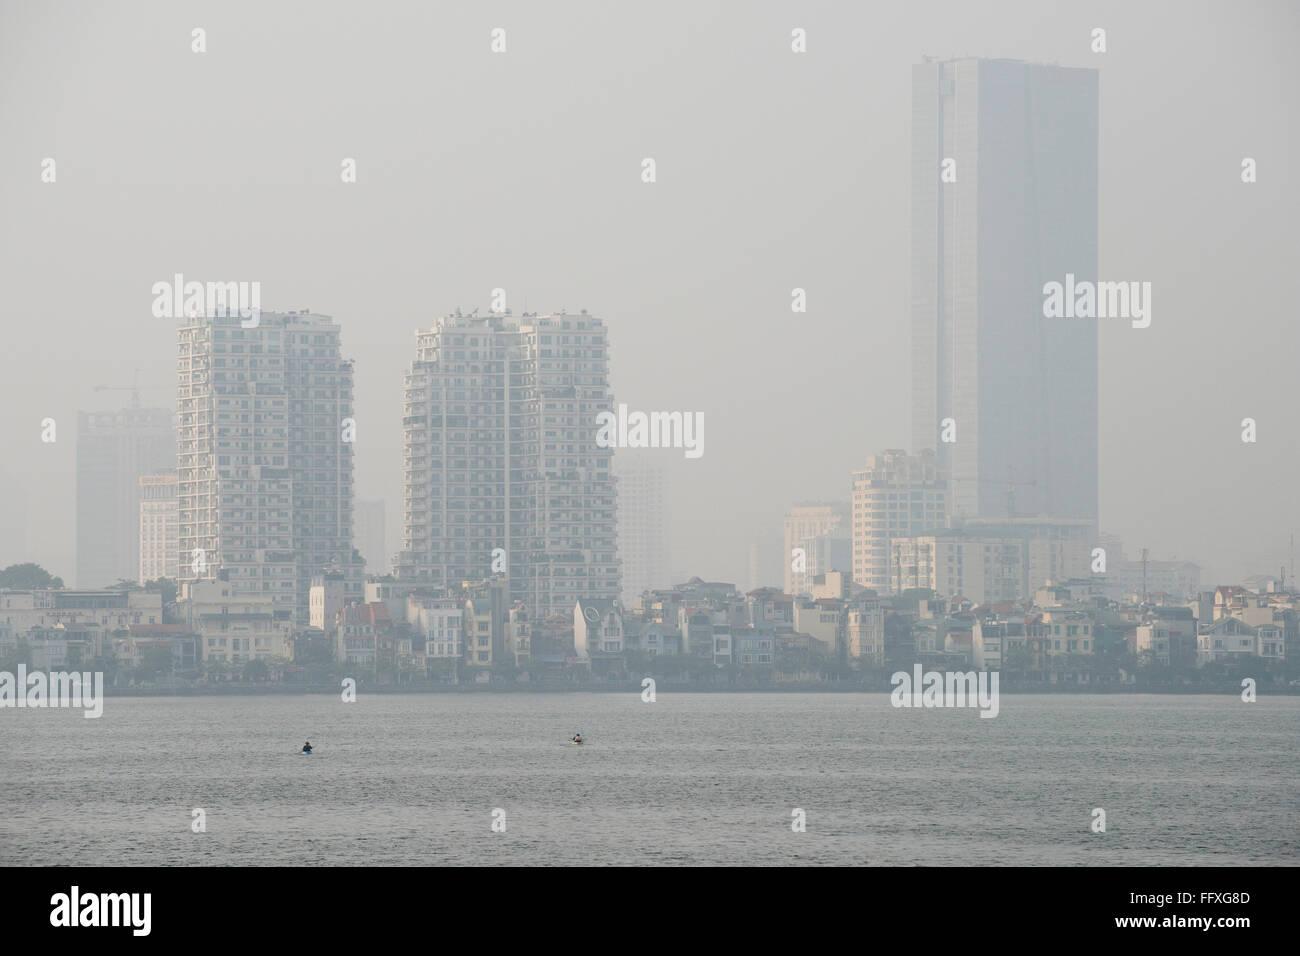 Mist, fog or smog pollution in a hazy skyline of Hanoi viewed over Westlake, Vietnam, January - Stock Image